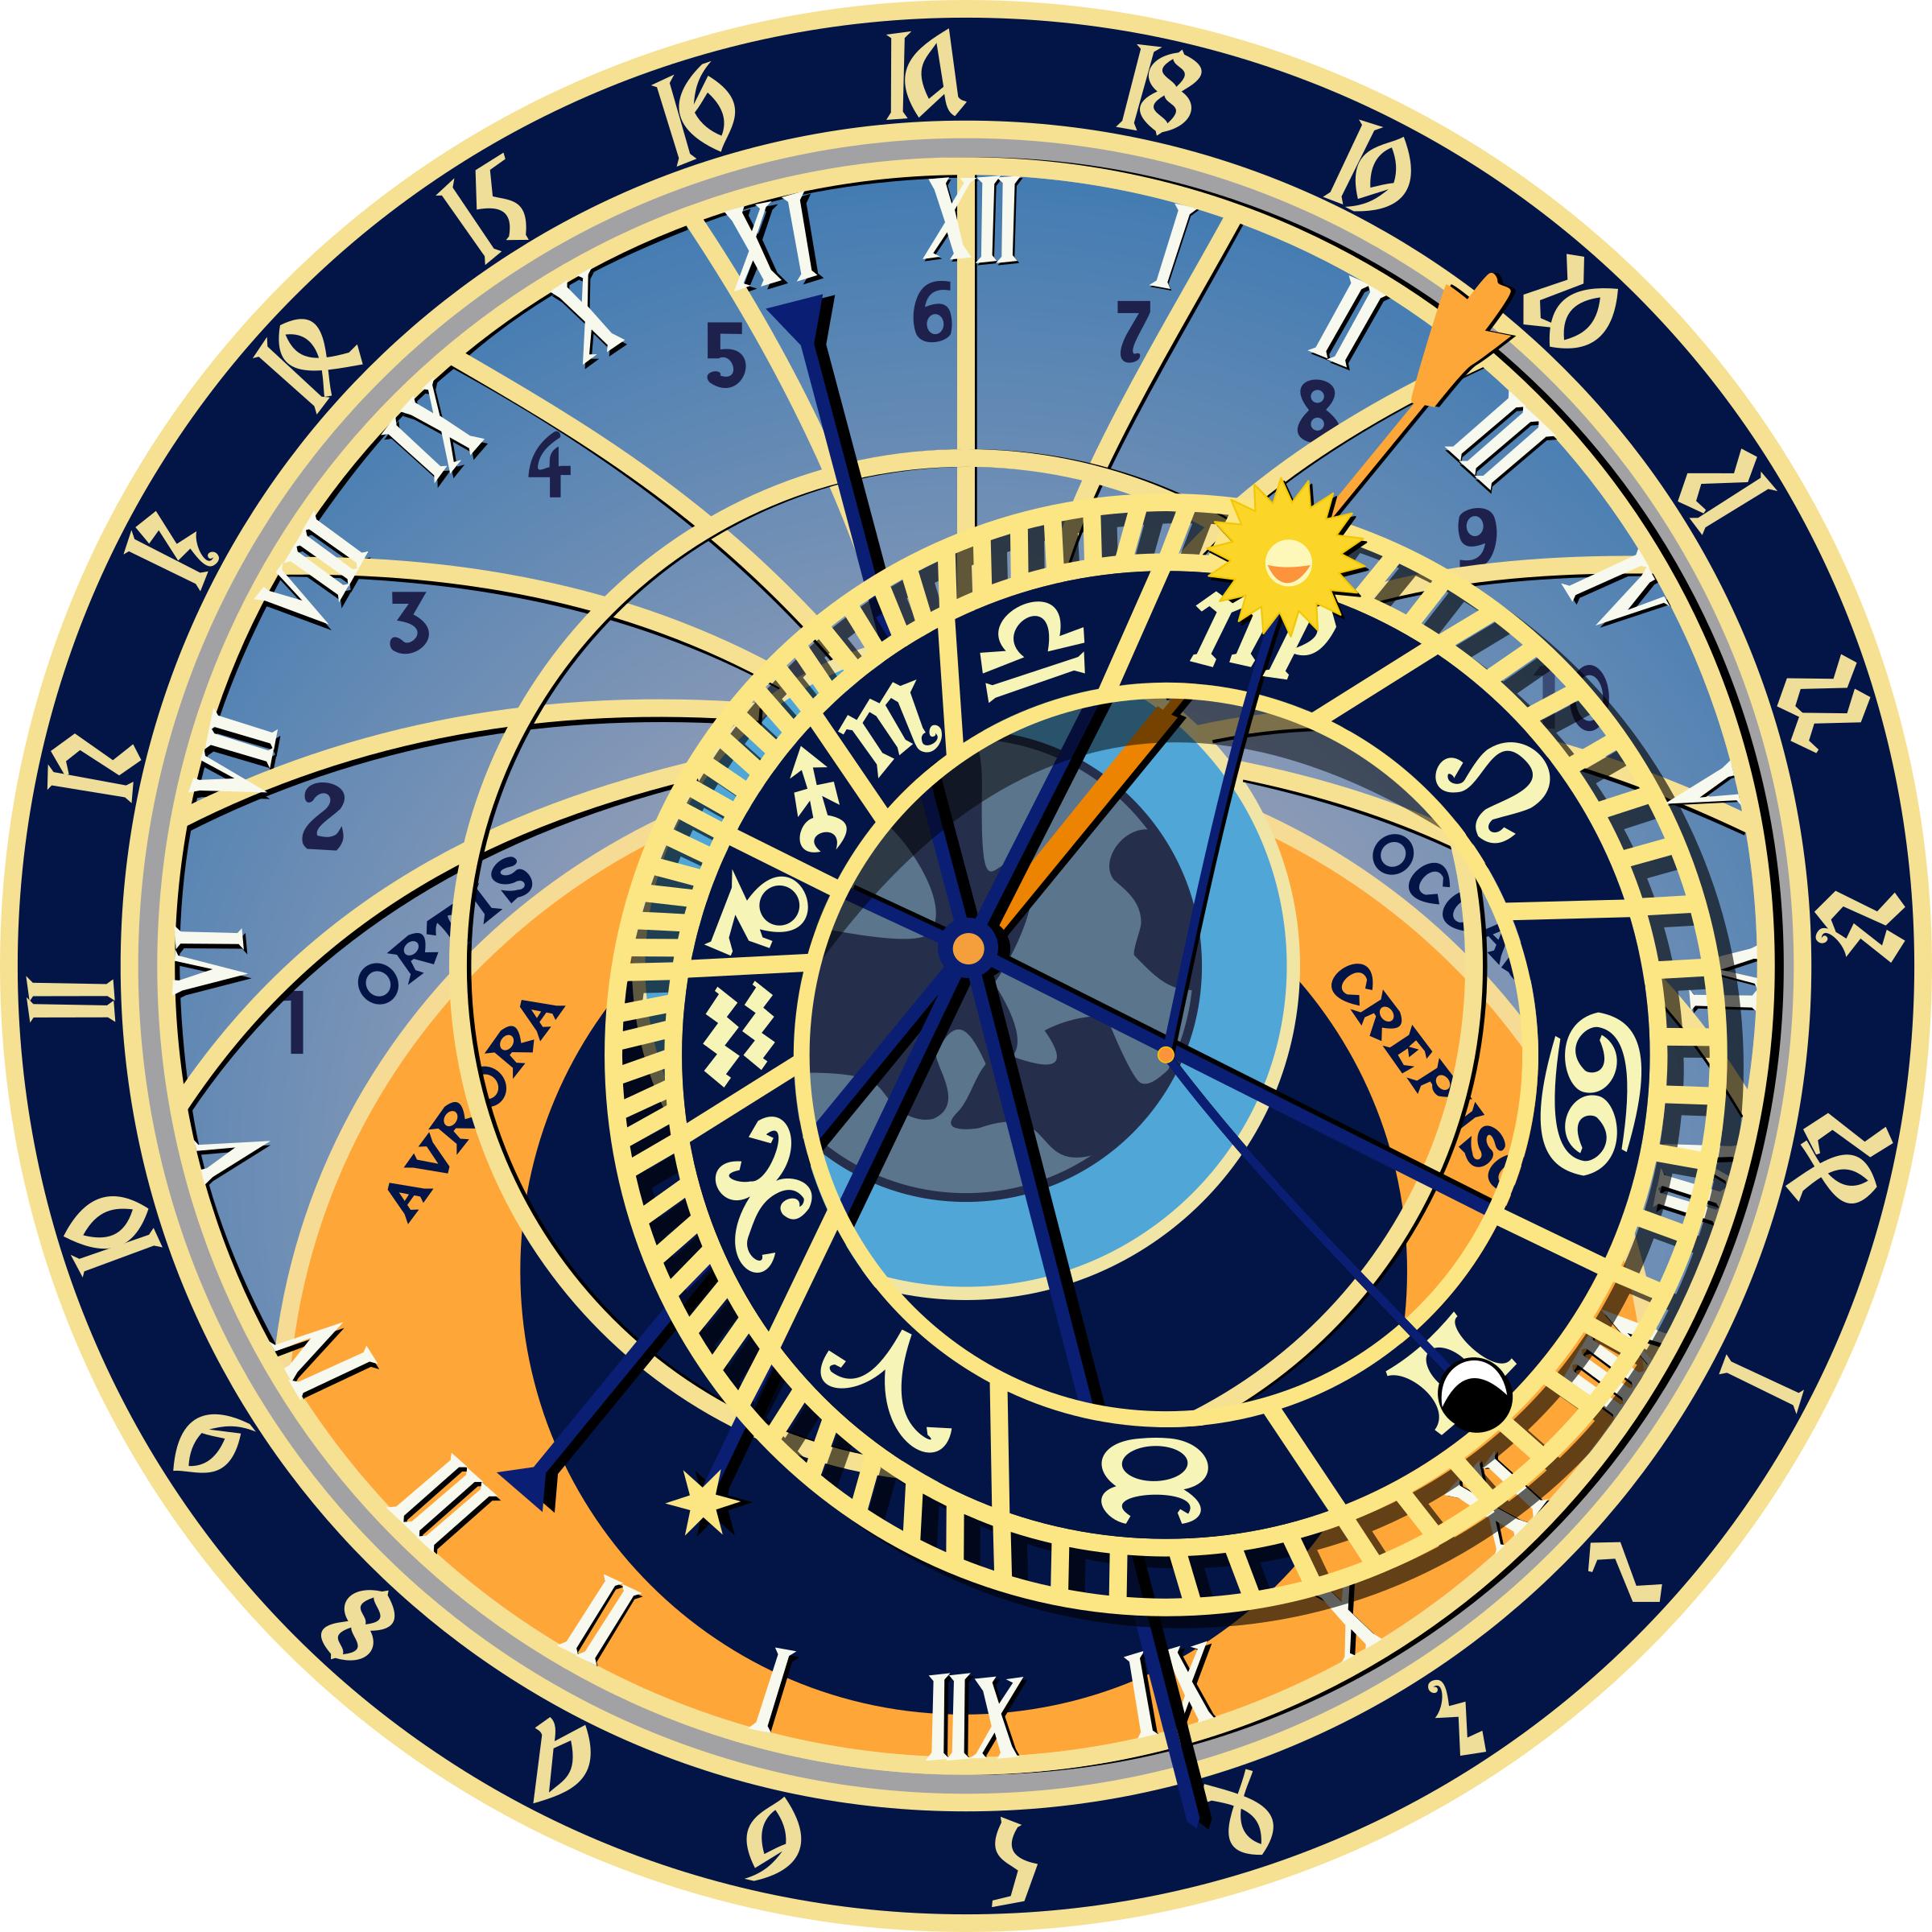 Astronomy clipart astronomer. Prague astronomical clock big